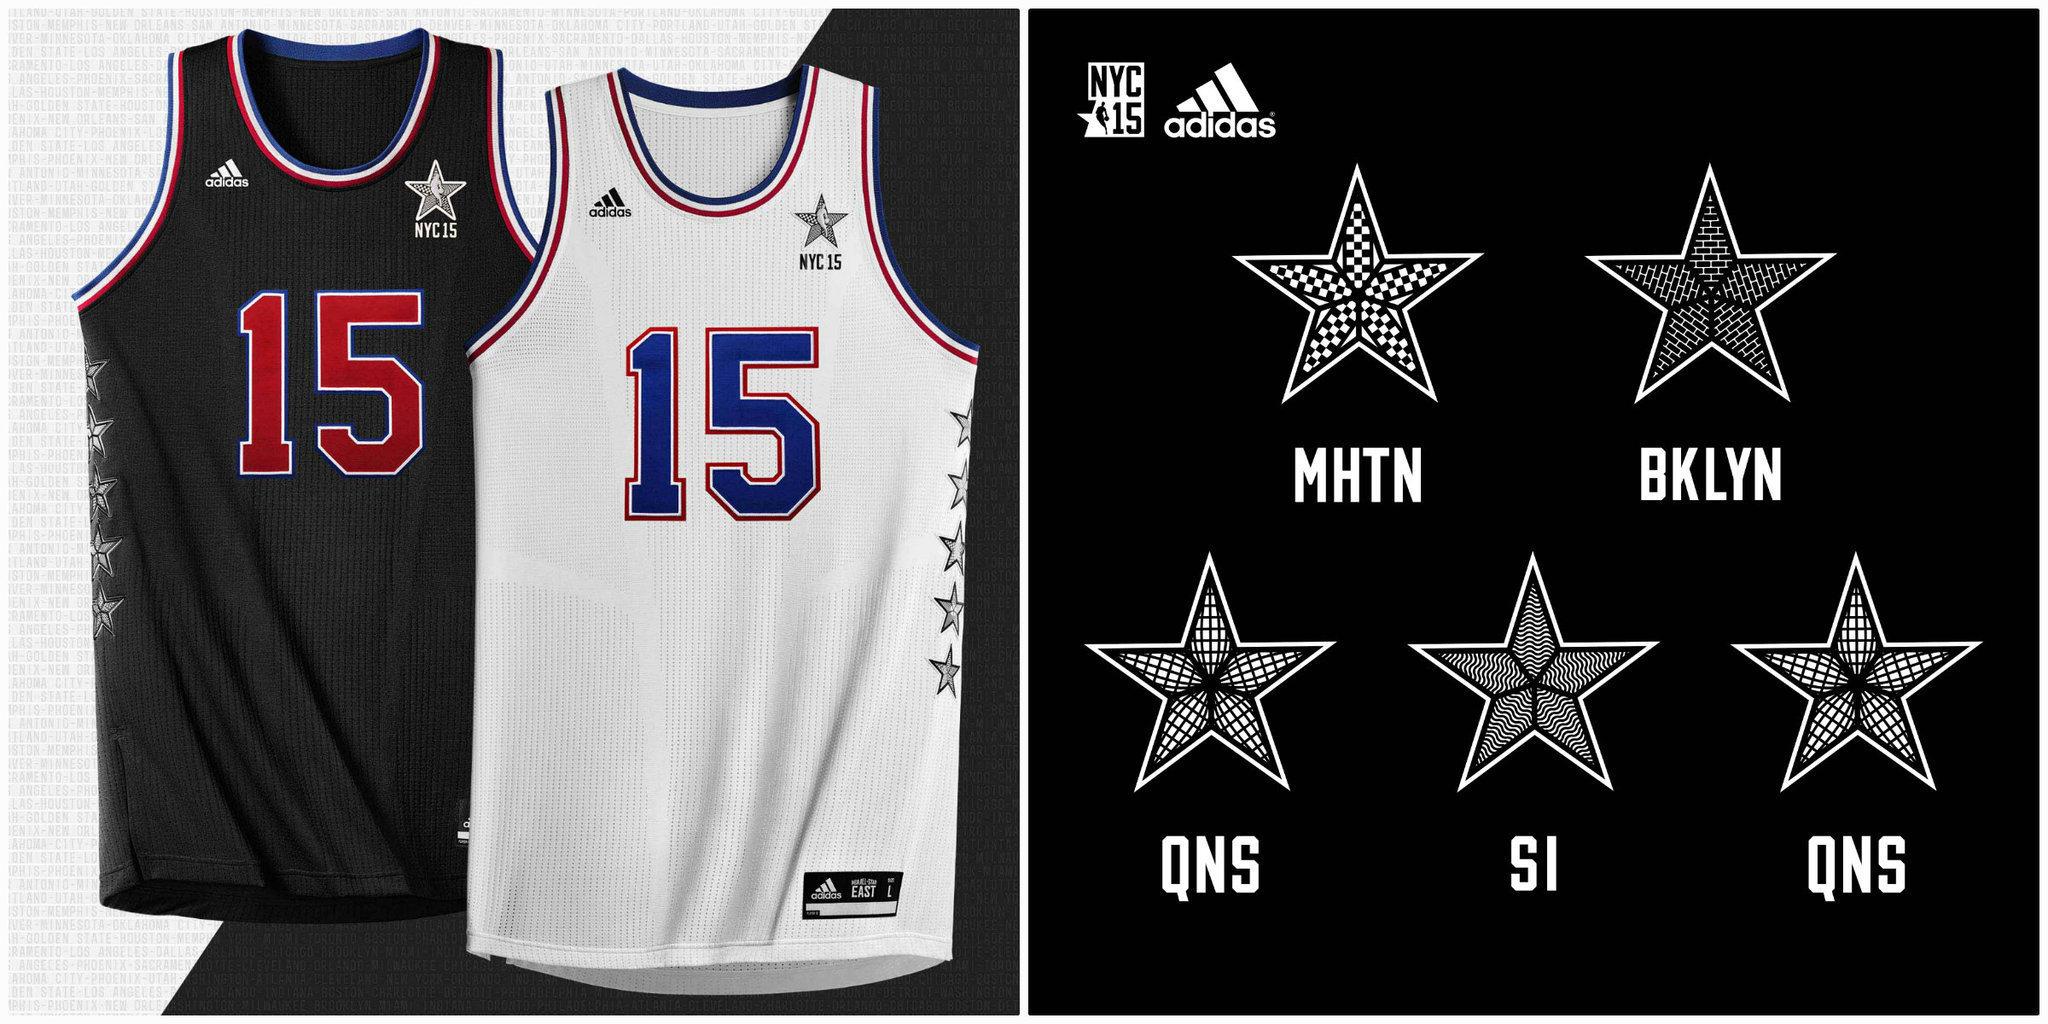 http://www.trbimg.com/img-5480dd7a/turbine/la-ar-adidas-unveils-a-fivestar-2015-nba-allstar-uniform-20141204